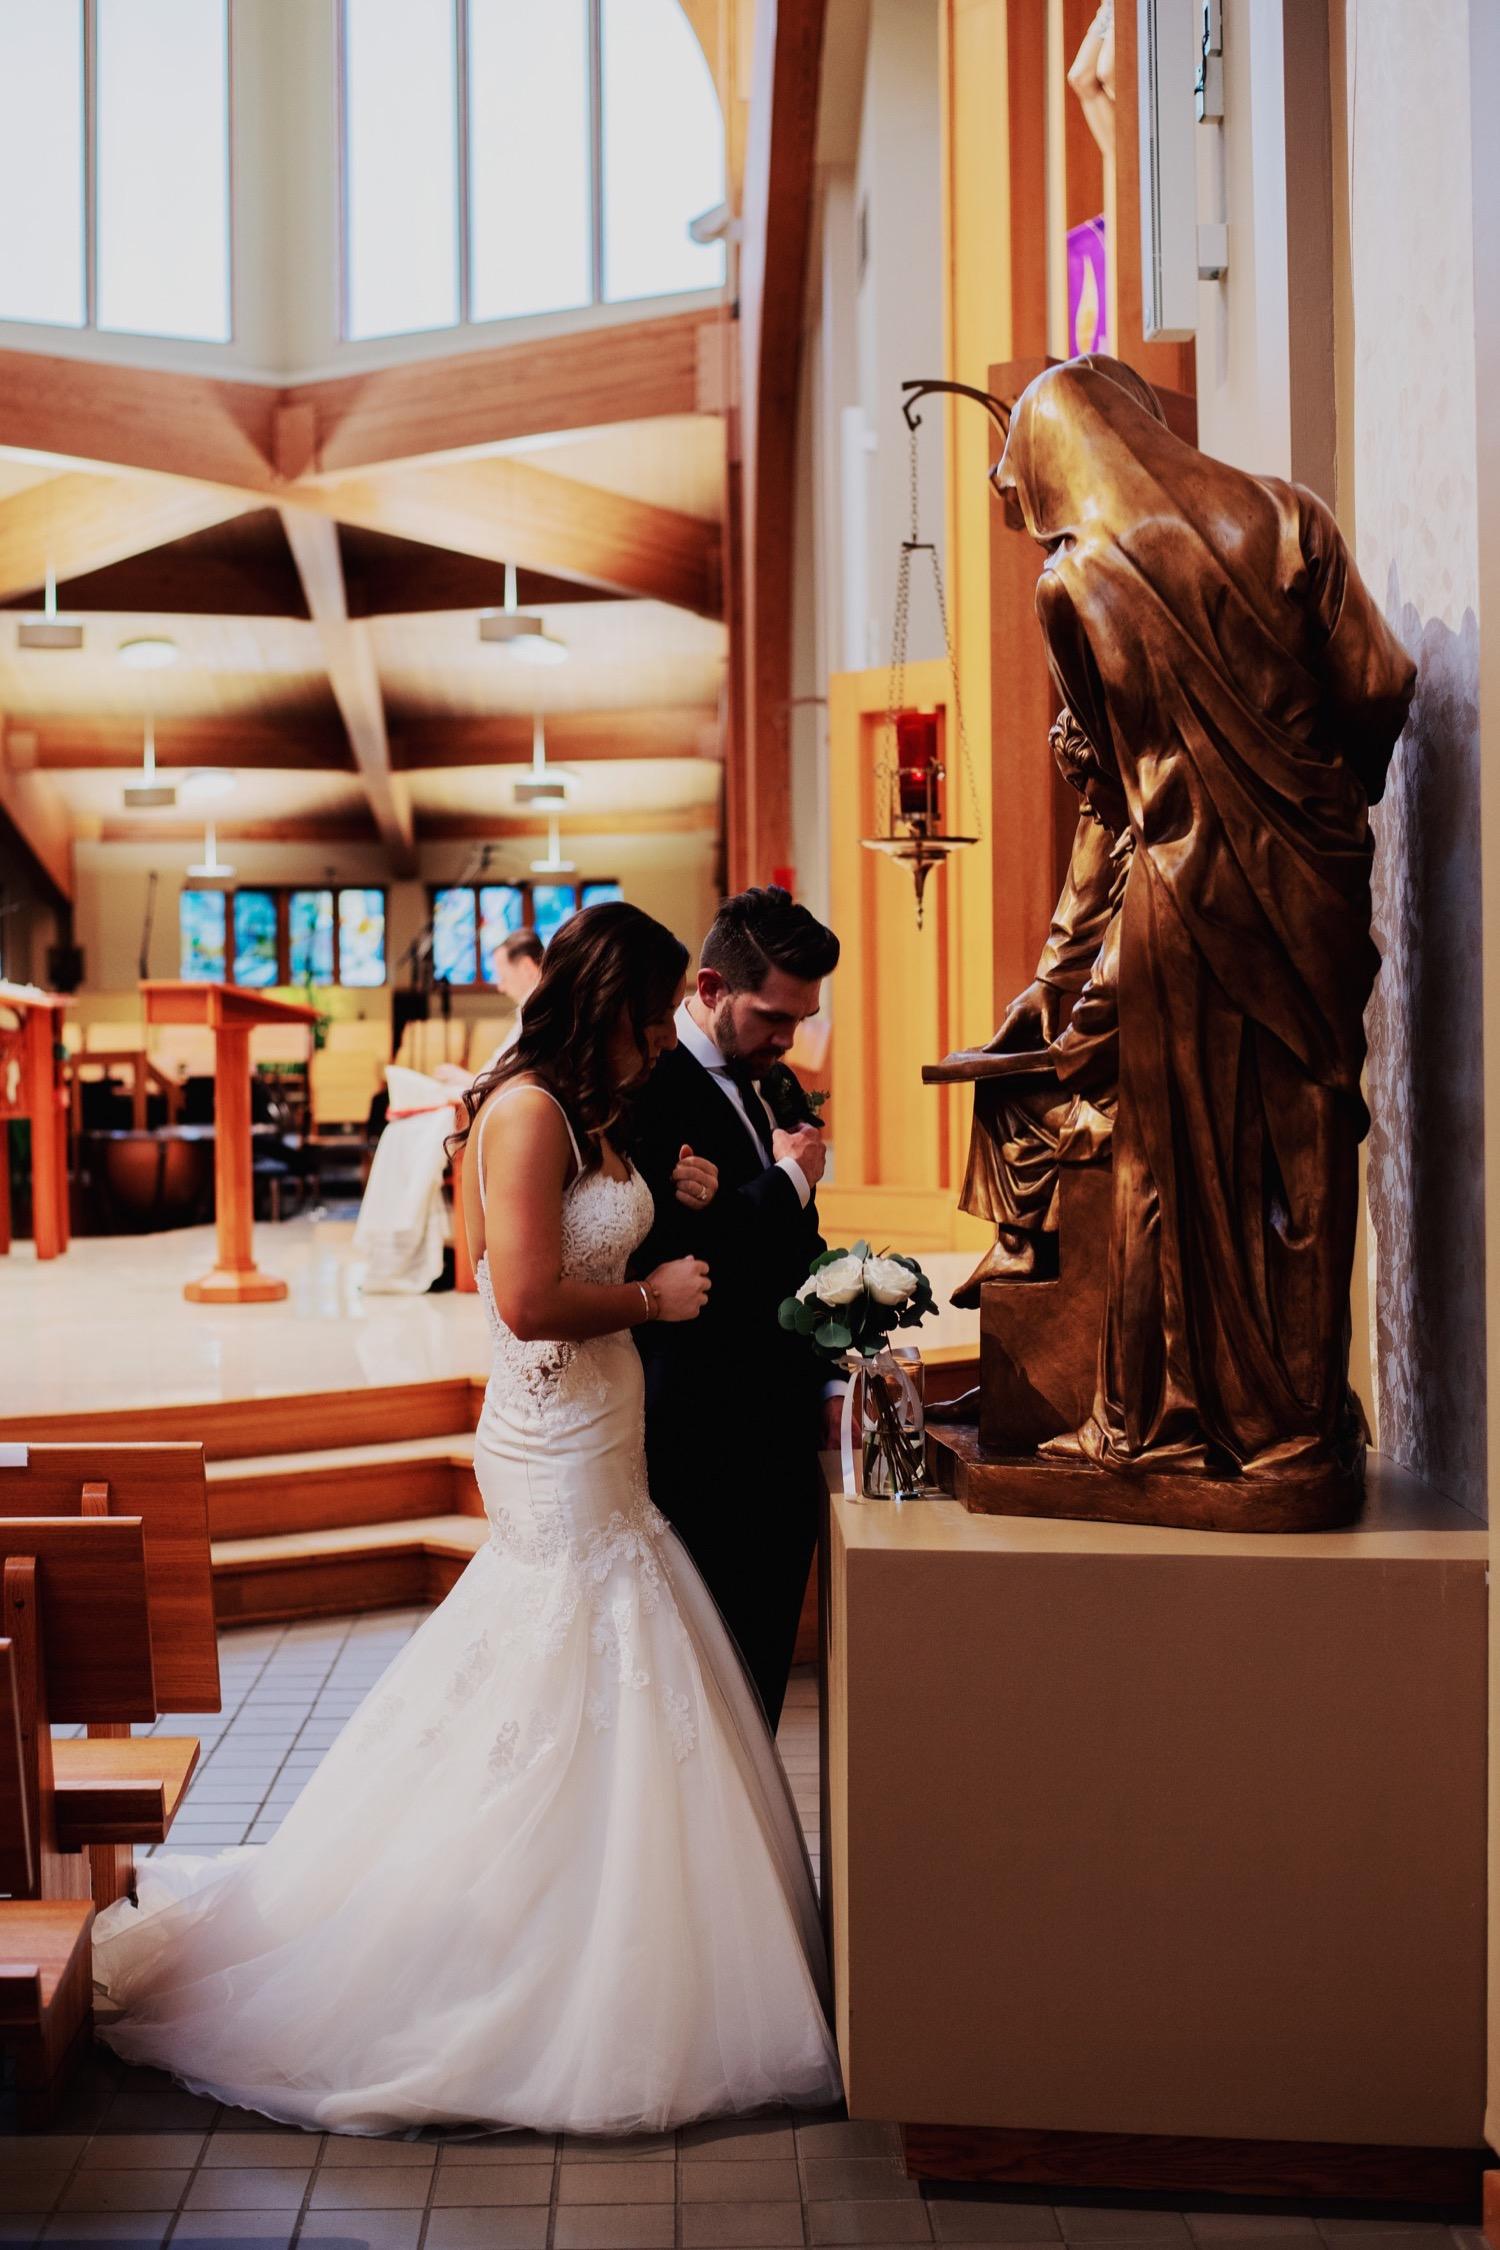 056_Haavig_Danada-Christmas-December-Wedding_0097.jpg